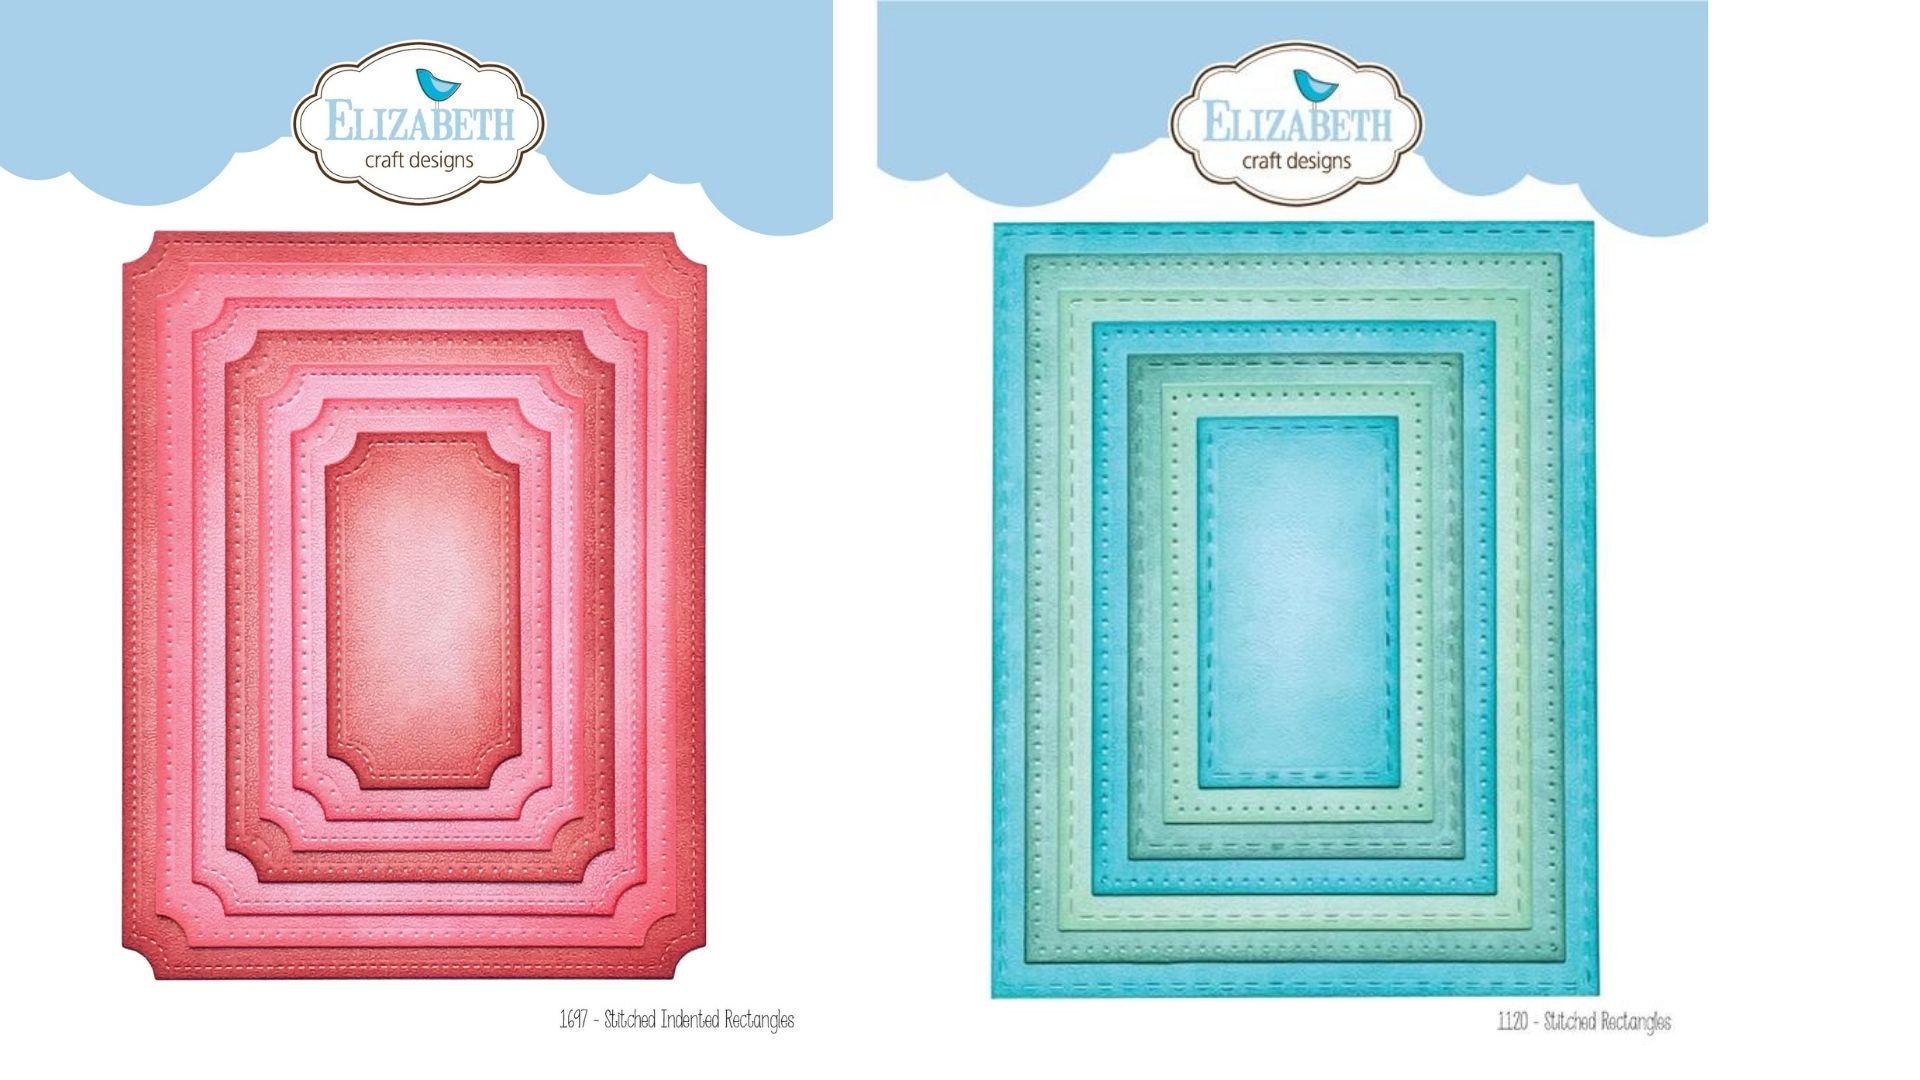 Elizabeth Craft Designs Stitched rectangles